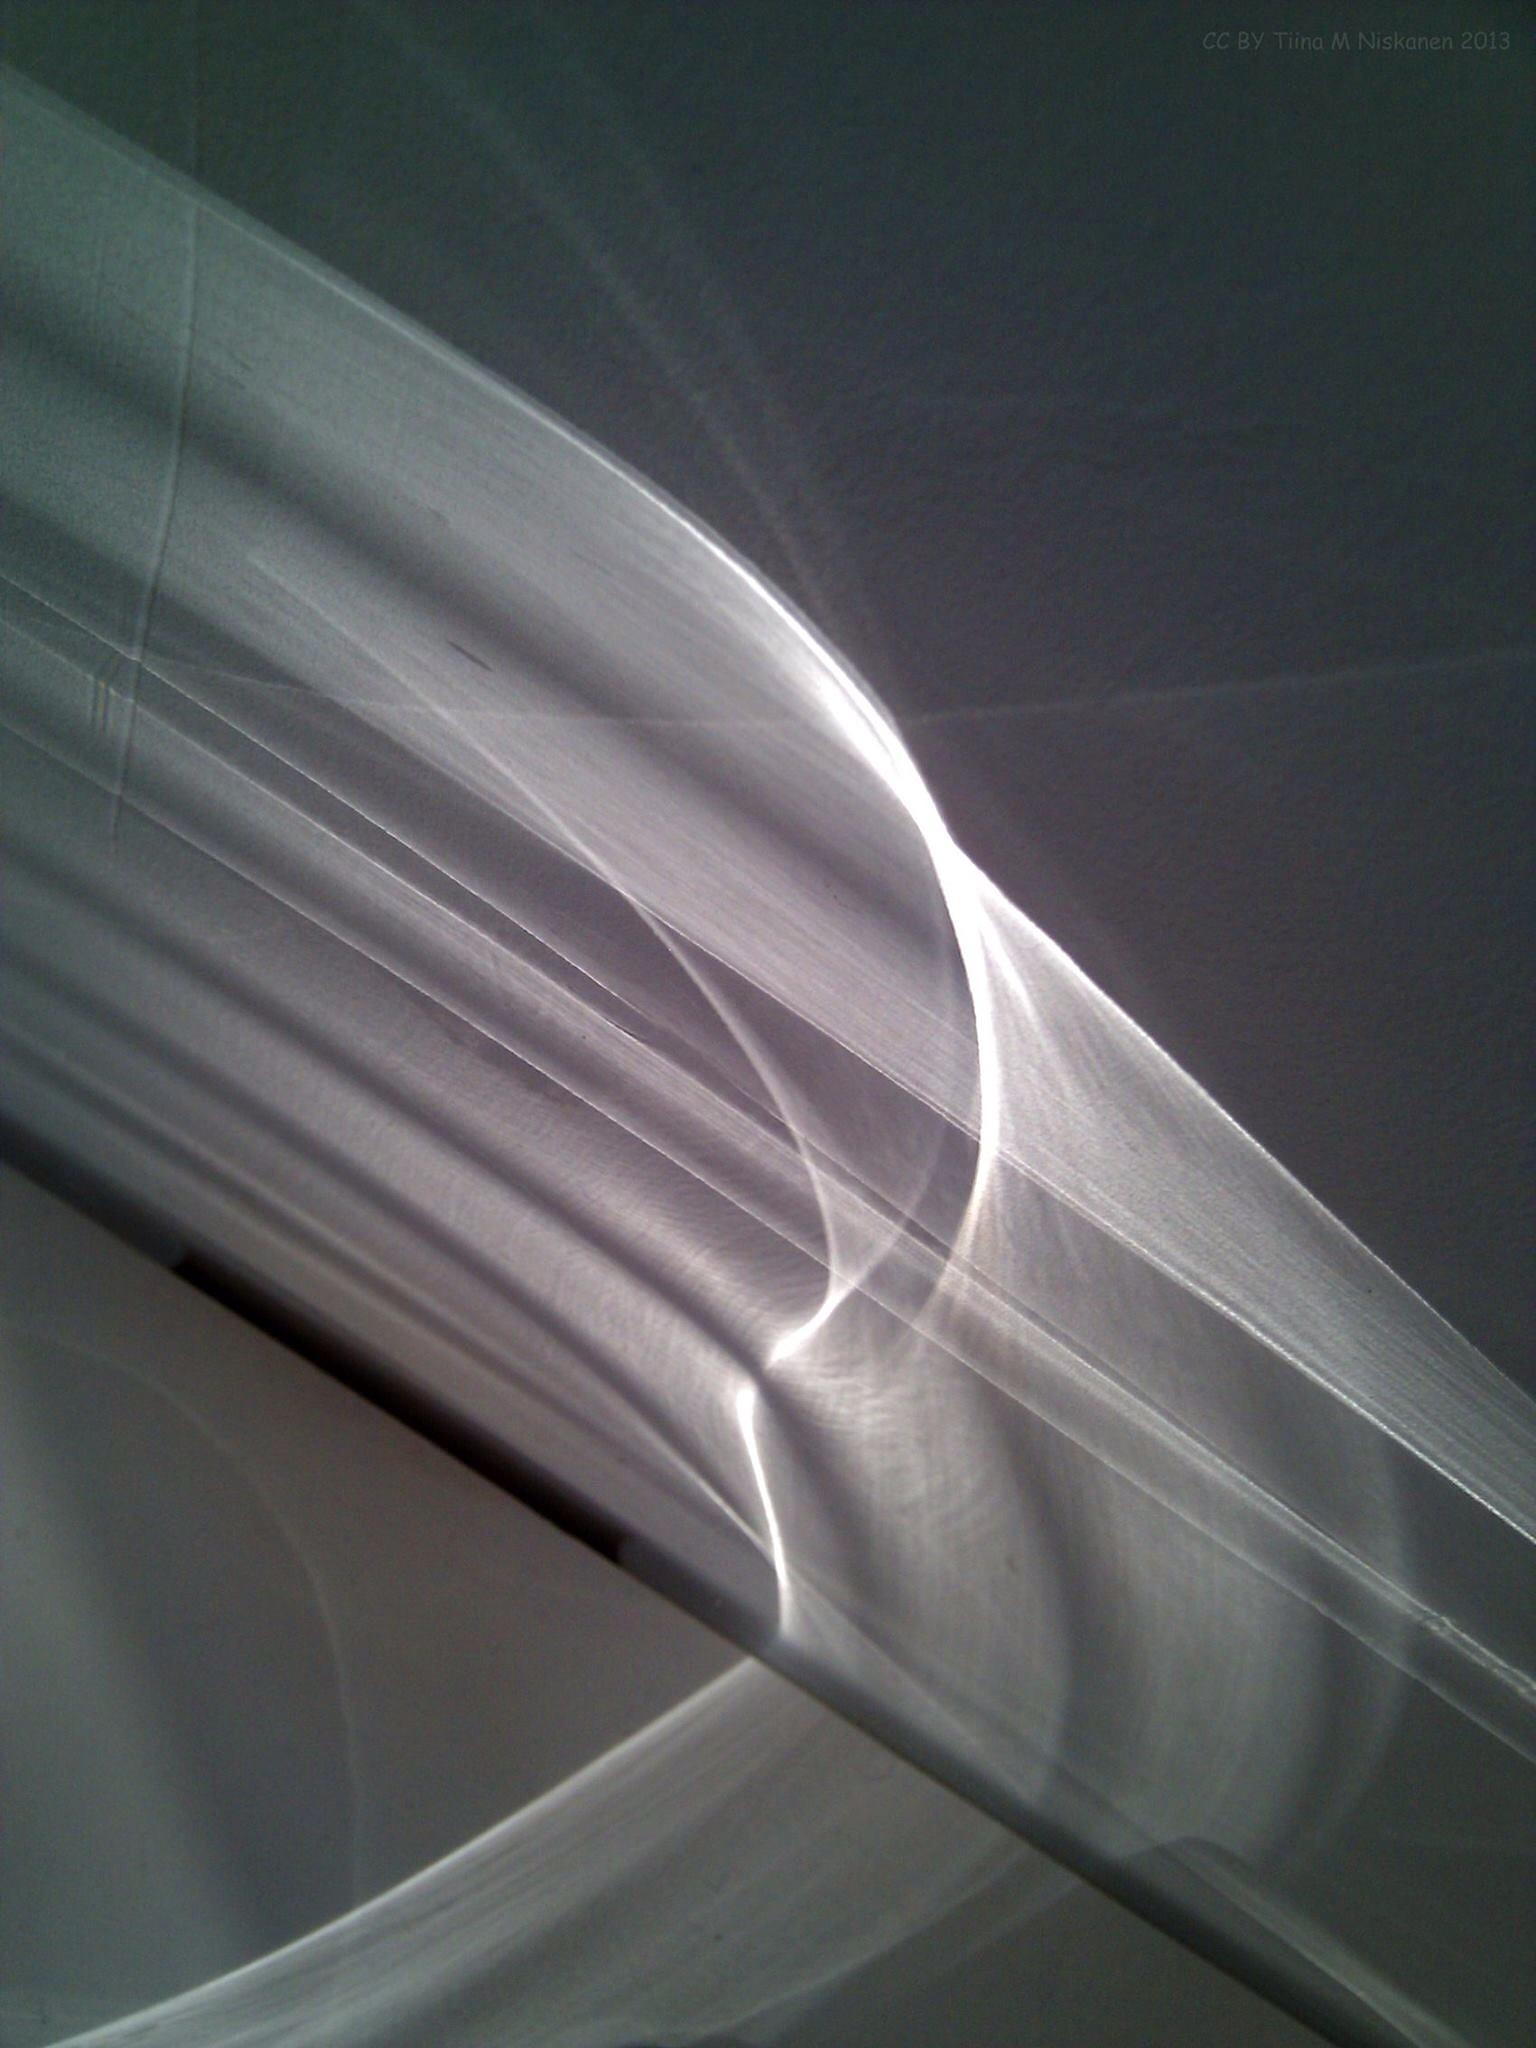 Reflections by Tiina Niskanen